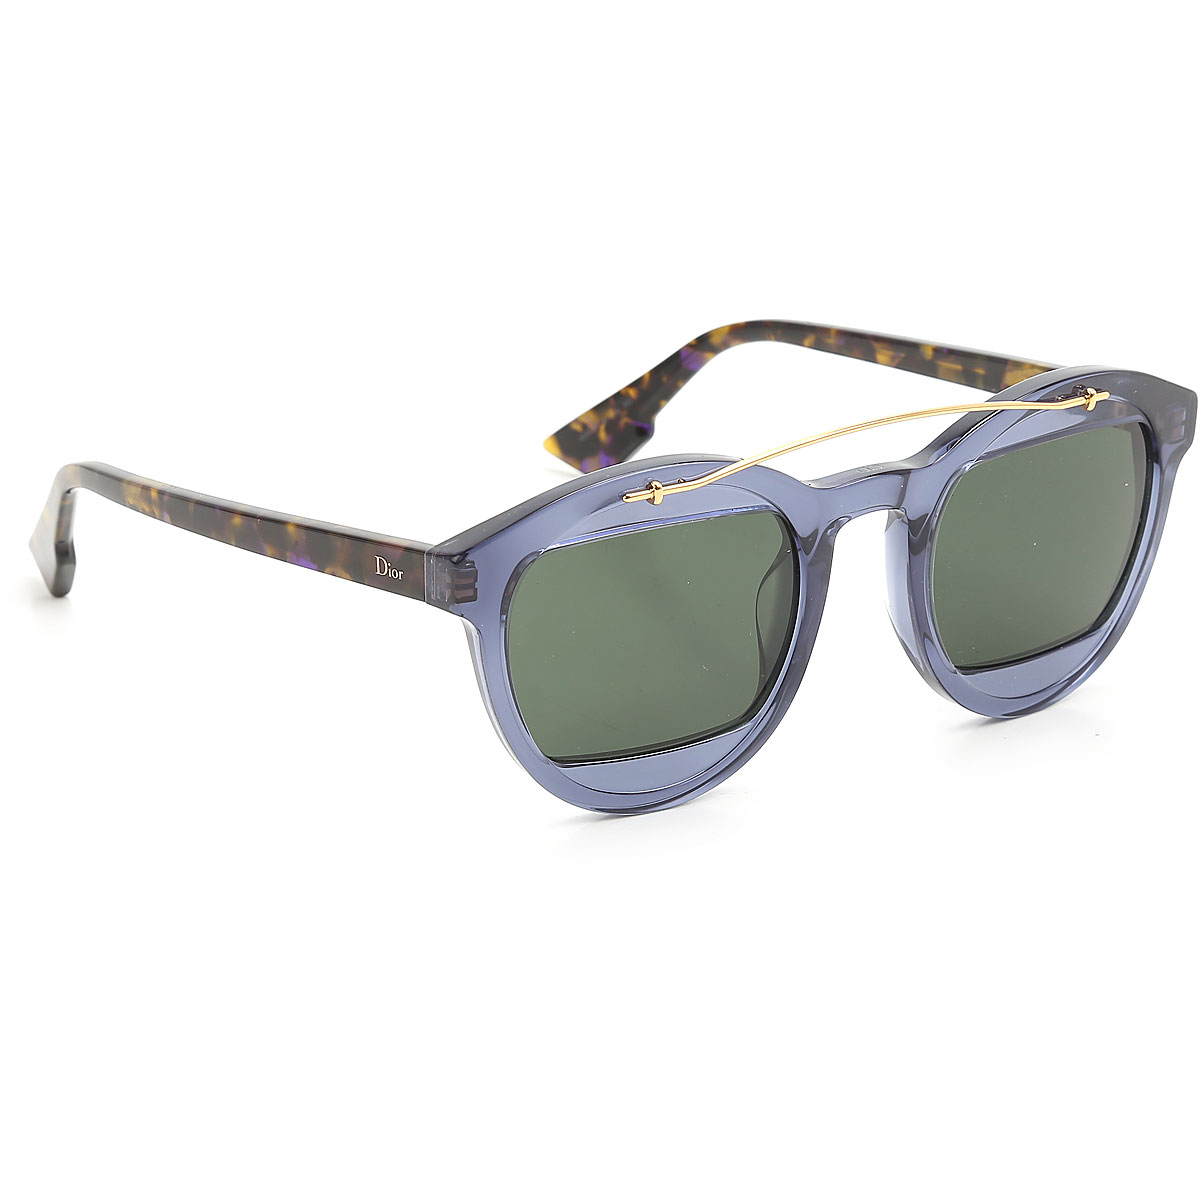 Christian Dior Sunglasses On Sale, Transparent Blue, 2019